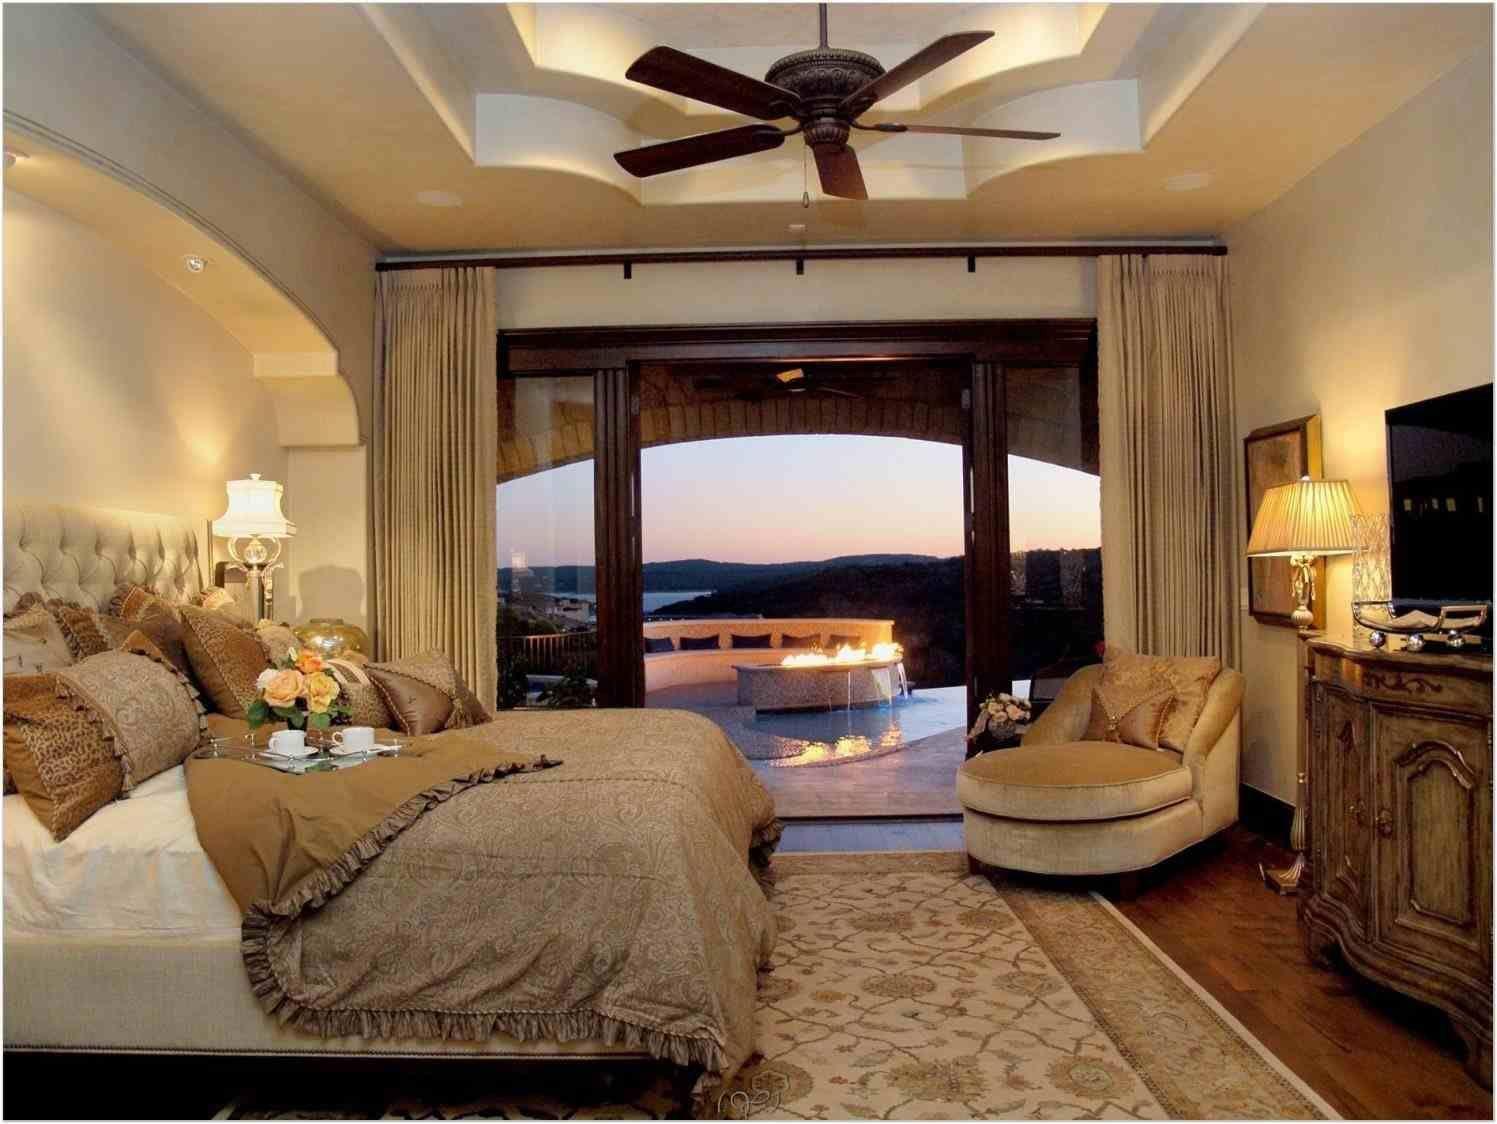 Bedroom Tumblr Luxury Luxury Master Bedrooms Tumblr Luxury Bedroom Master Western Style Decor Modern Bedroom Furniture